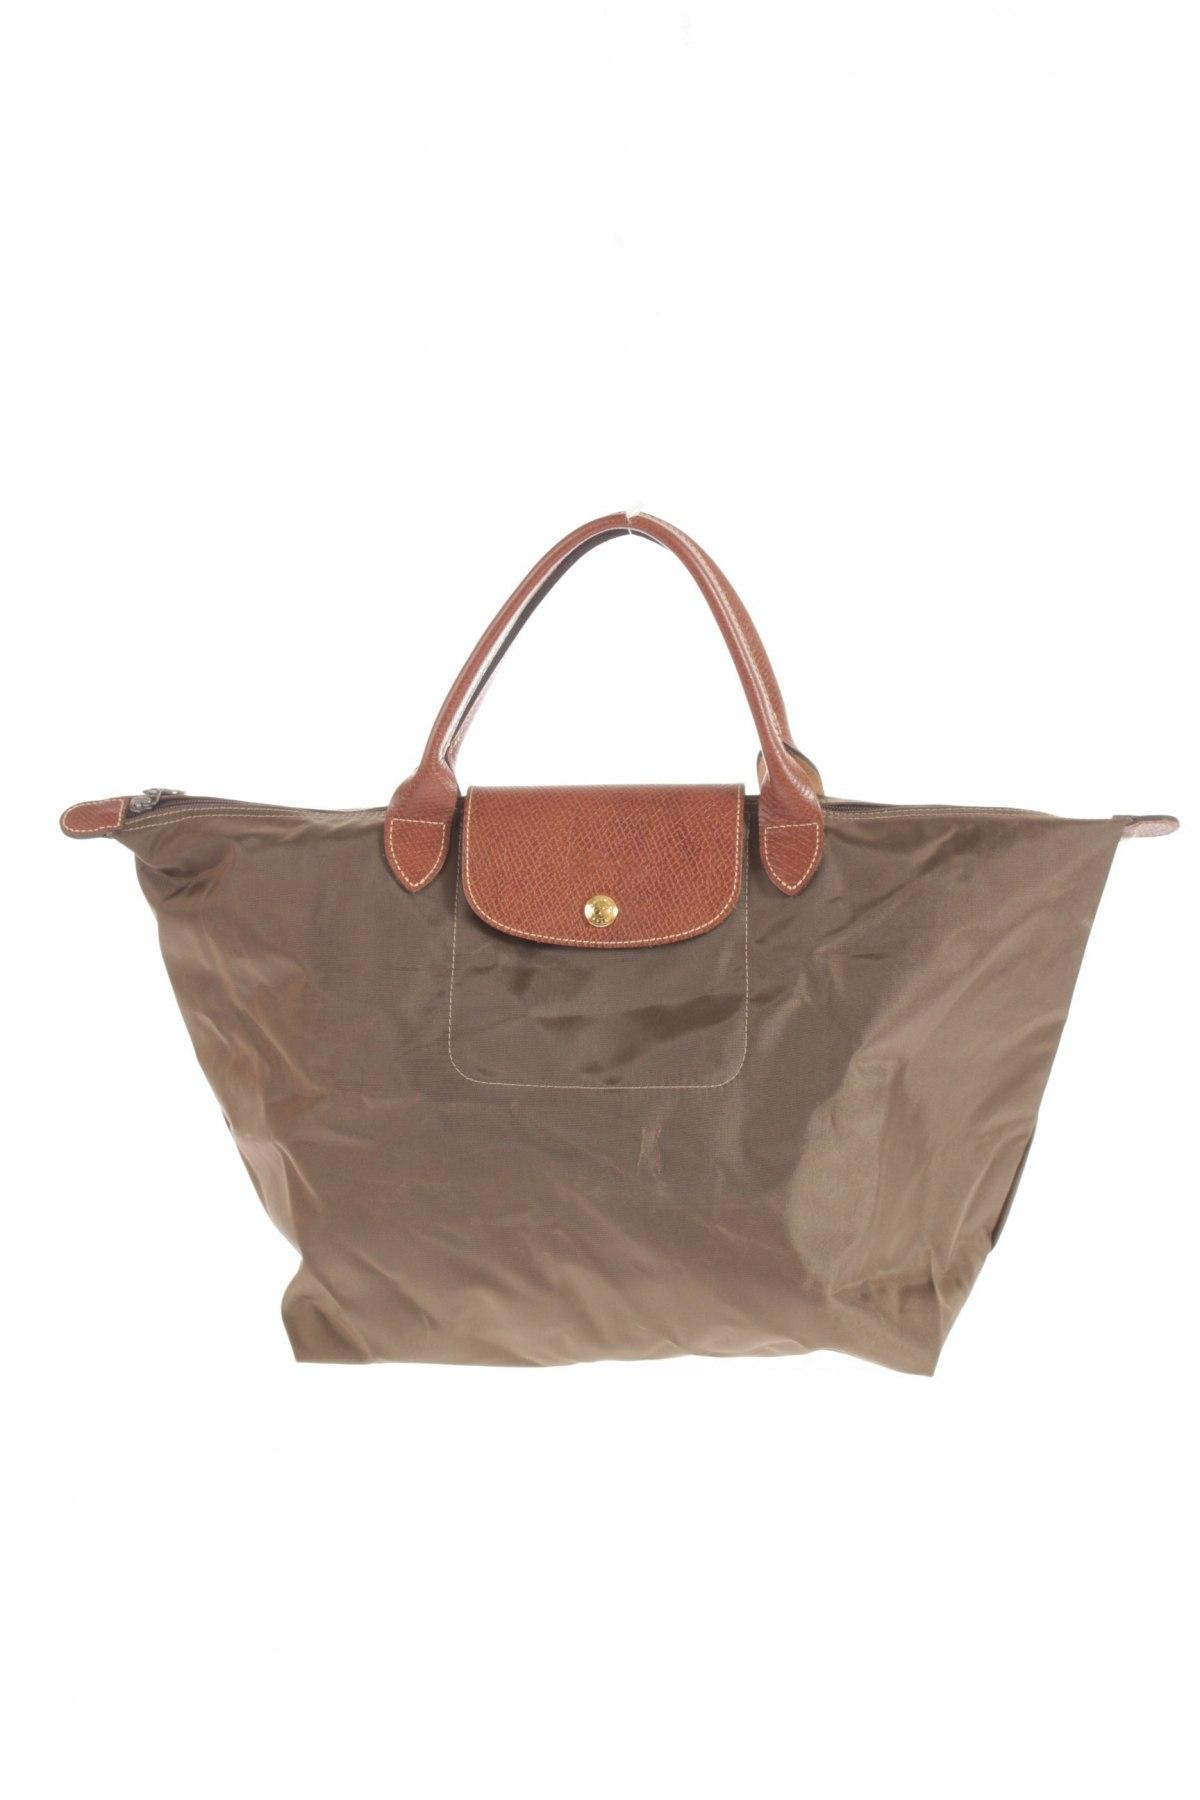 4f98c772b0 Γυναικεία τσάντα Longchamp - σε συμφέρουσα τιμή στο Remix -  4124269